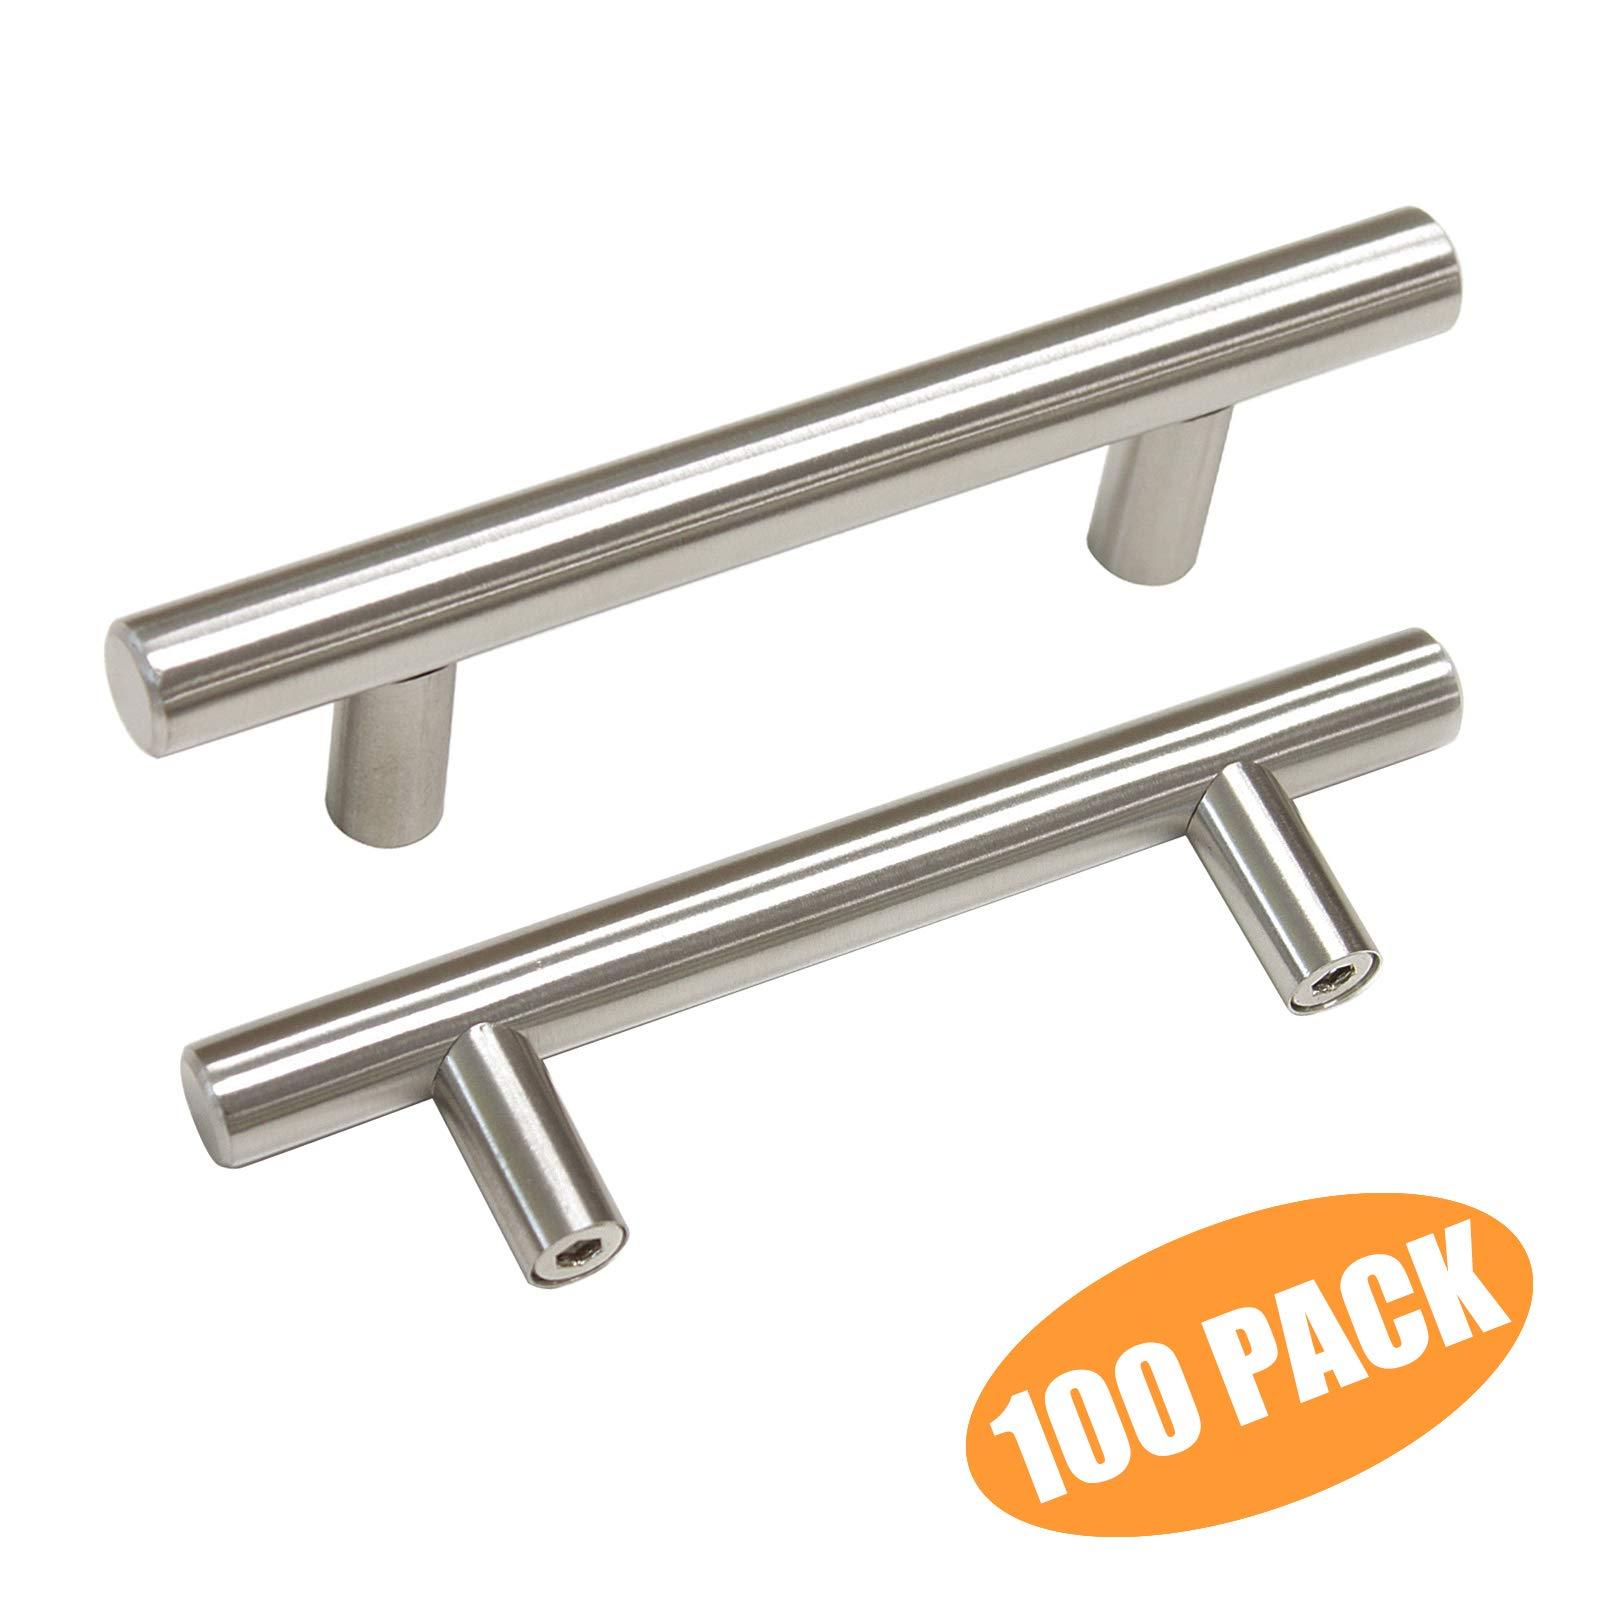 Probrico 3'' Hole Centers Euro T Bar Cabinet Pulls Satin Nickel Kitchen Cabinet Hardware Stainless Steel Bathroom Bedroom Dresser Drawer Knobs Handles(100 Pack)